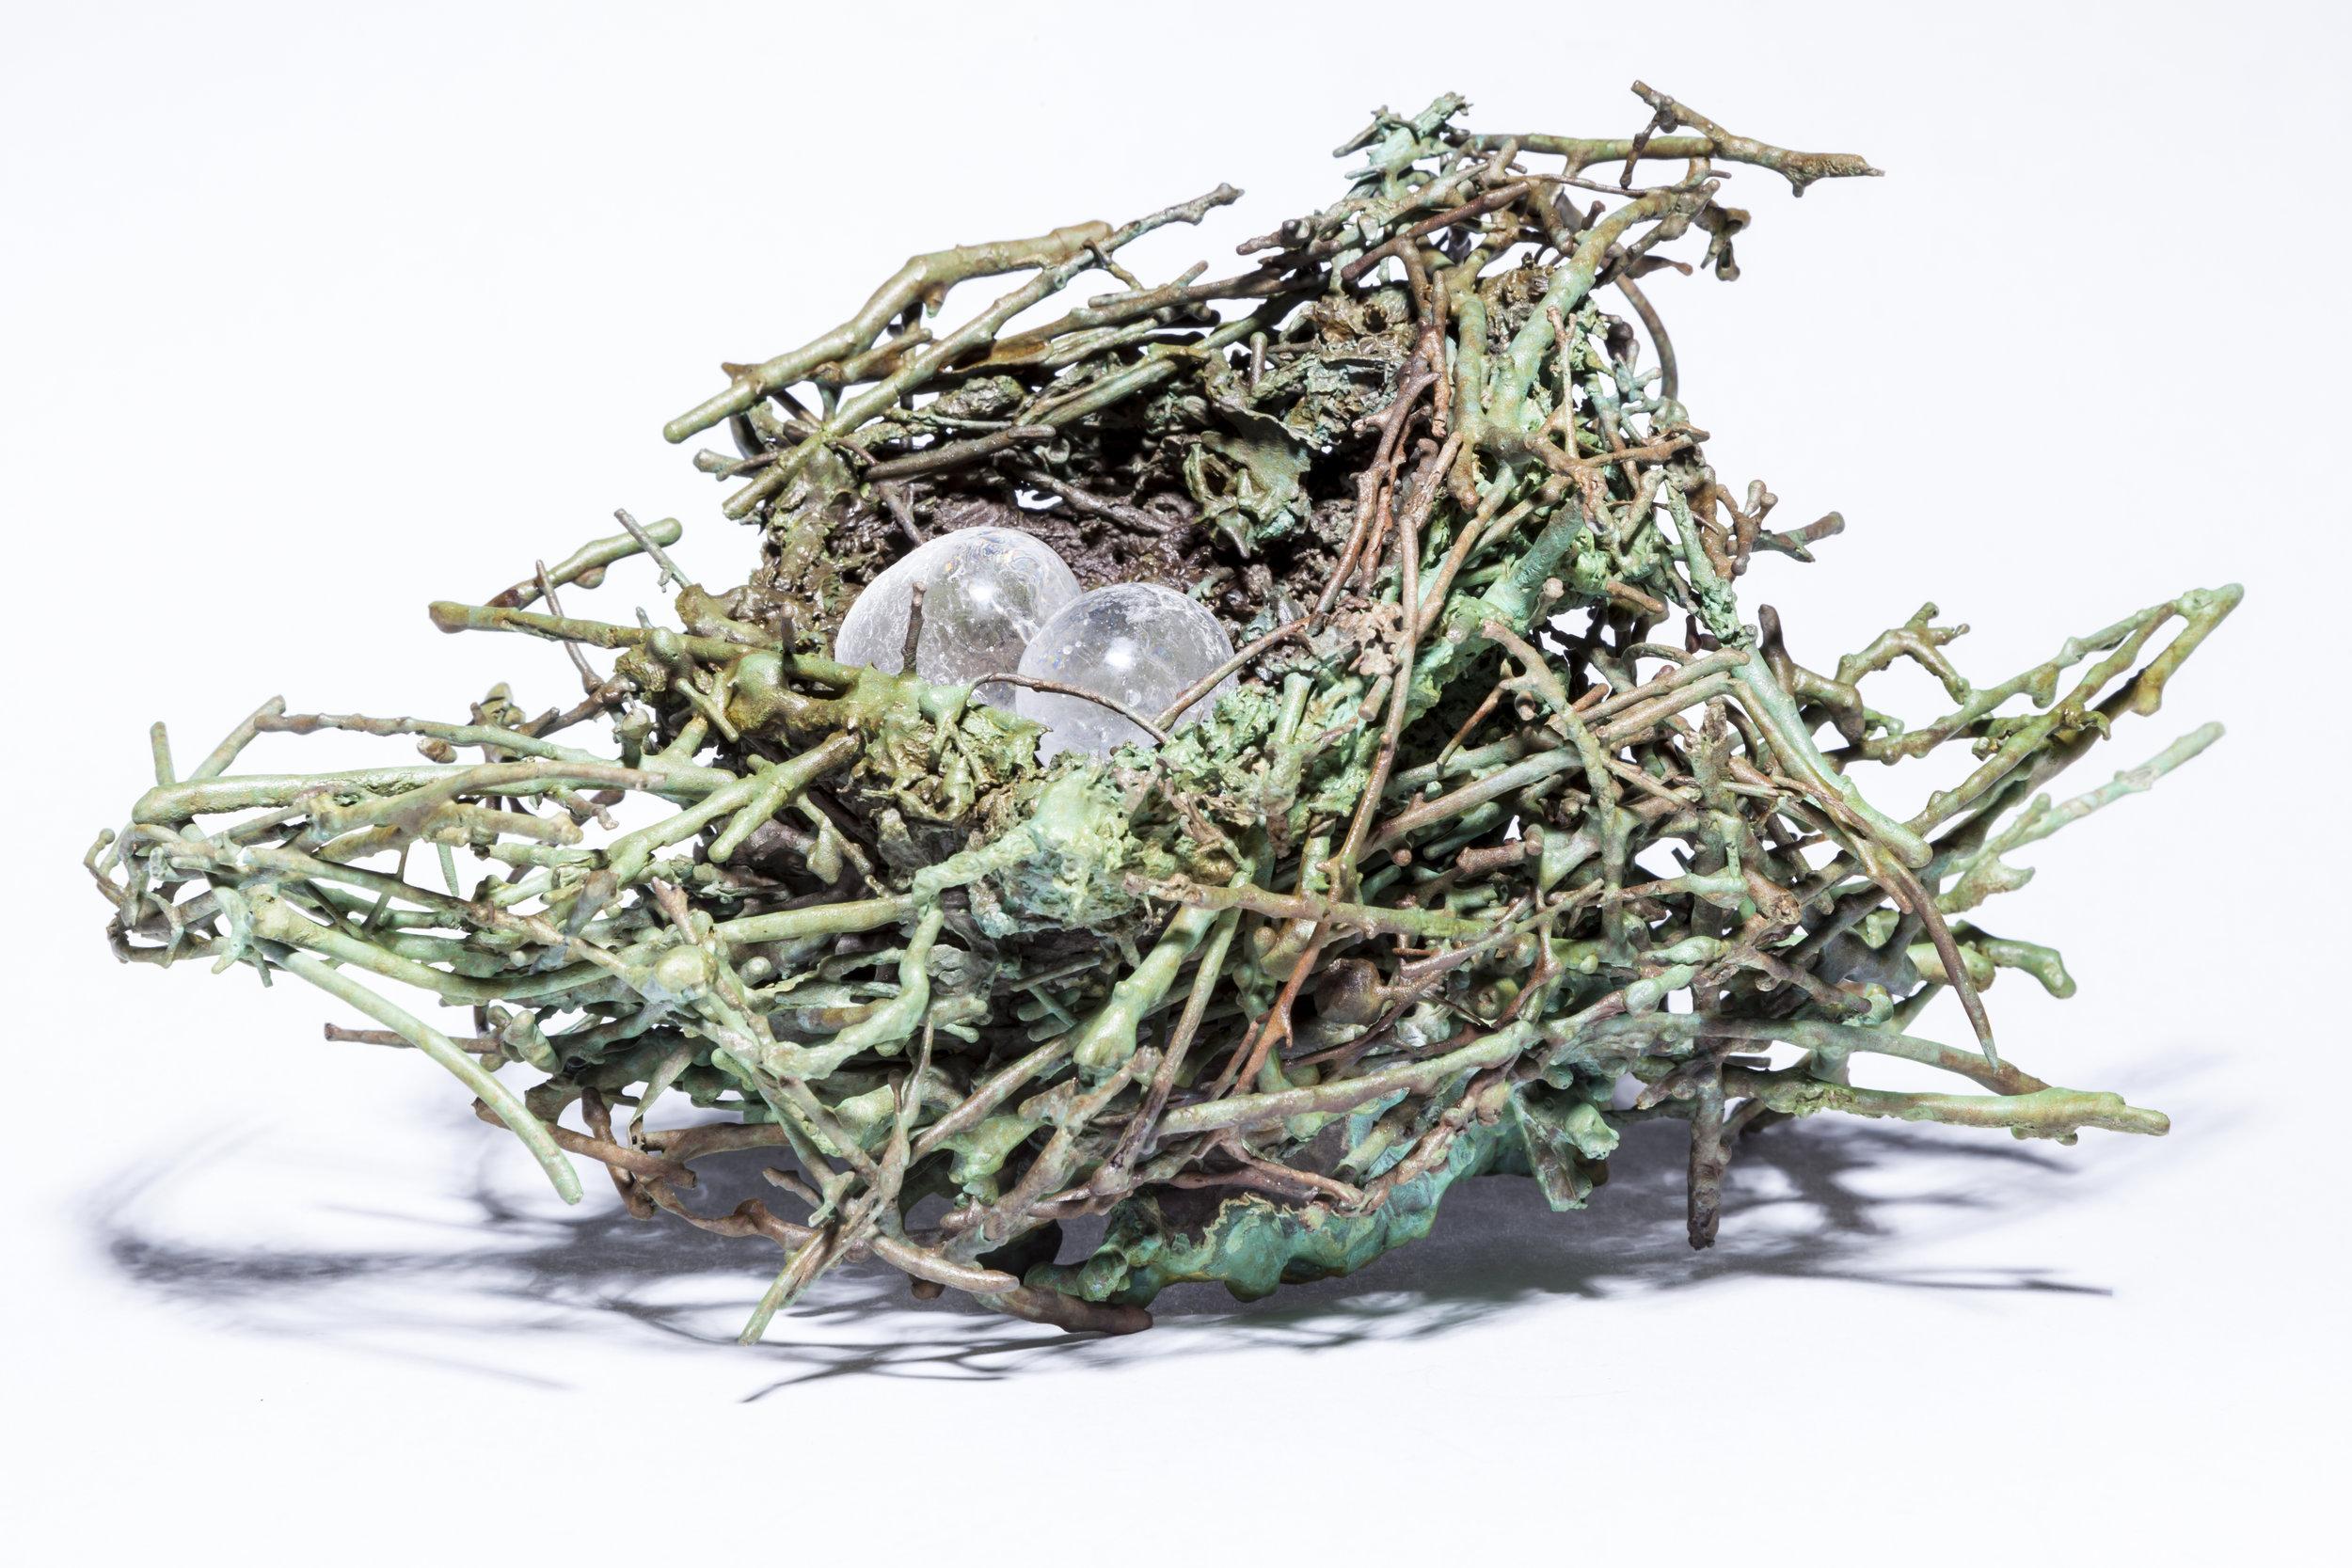 BaleCreekAllen Nests-026.jpg